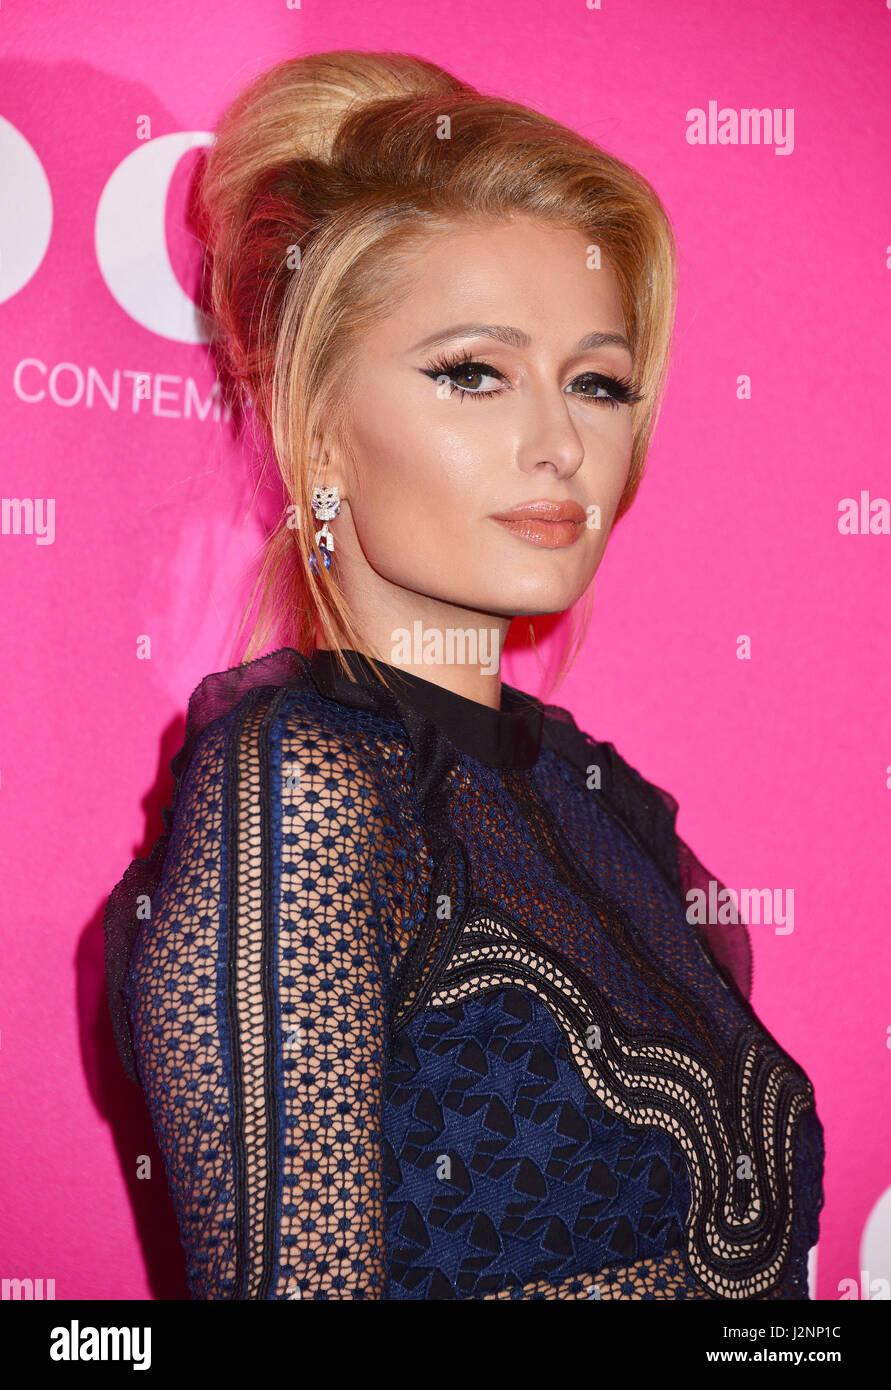 Los Angeles, California, USA. 29 apr, 2017. Paris Hilton 67 arriva al 2017 MOCA Gala a til Geffen Contemporary al Immagini Stock